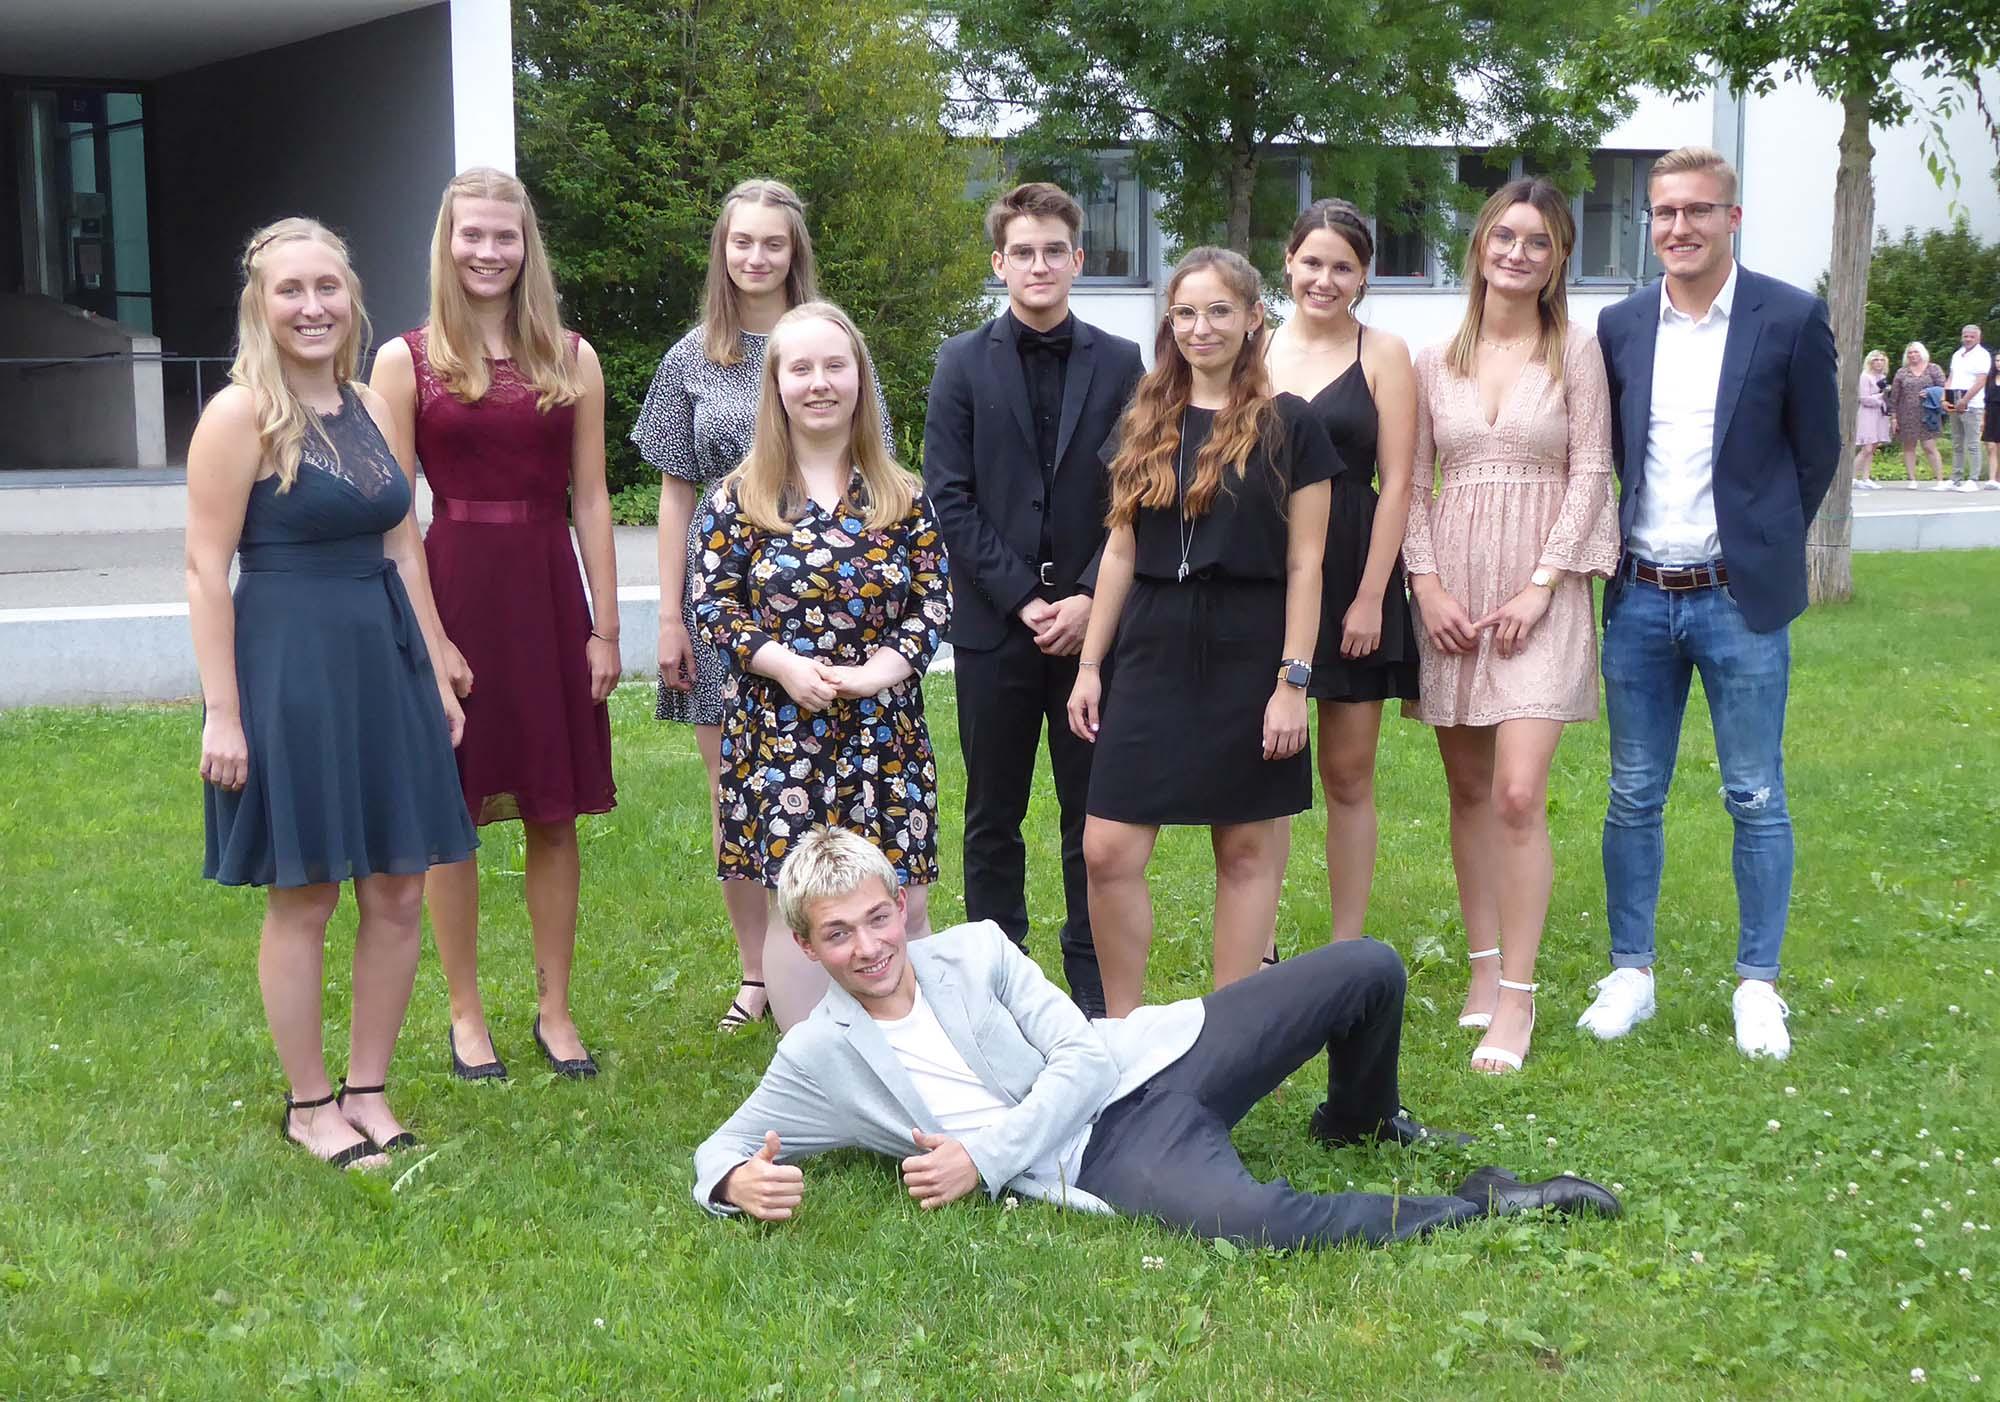 021-7-19-Hausach-Schule-Gymnasium-Preisträger-P1190770